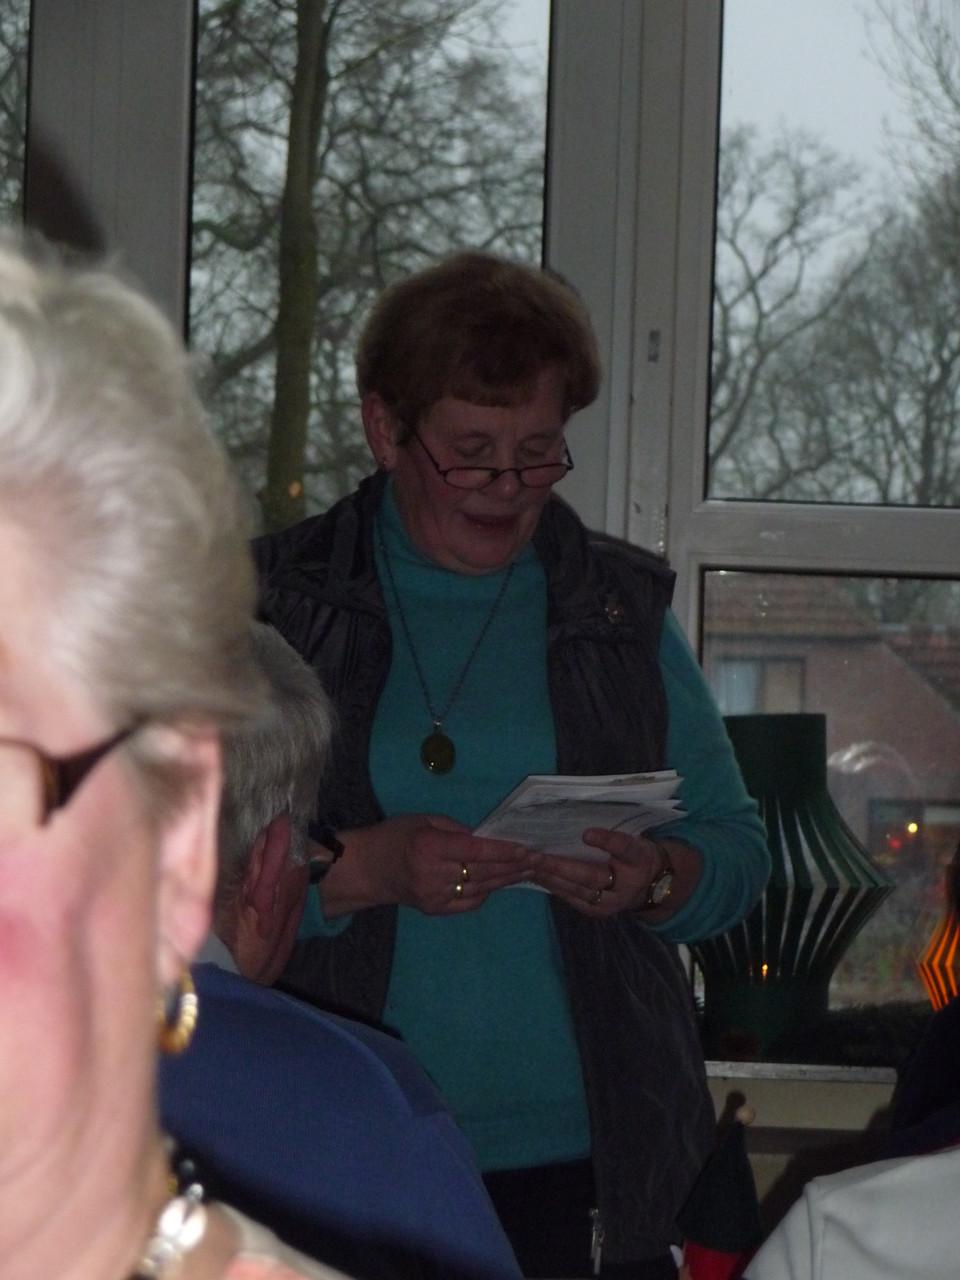 Irmgard liest unterhaltsame Geschichten vor